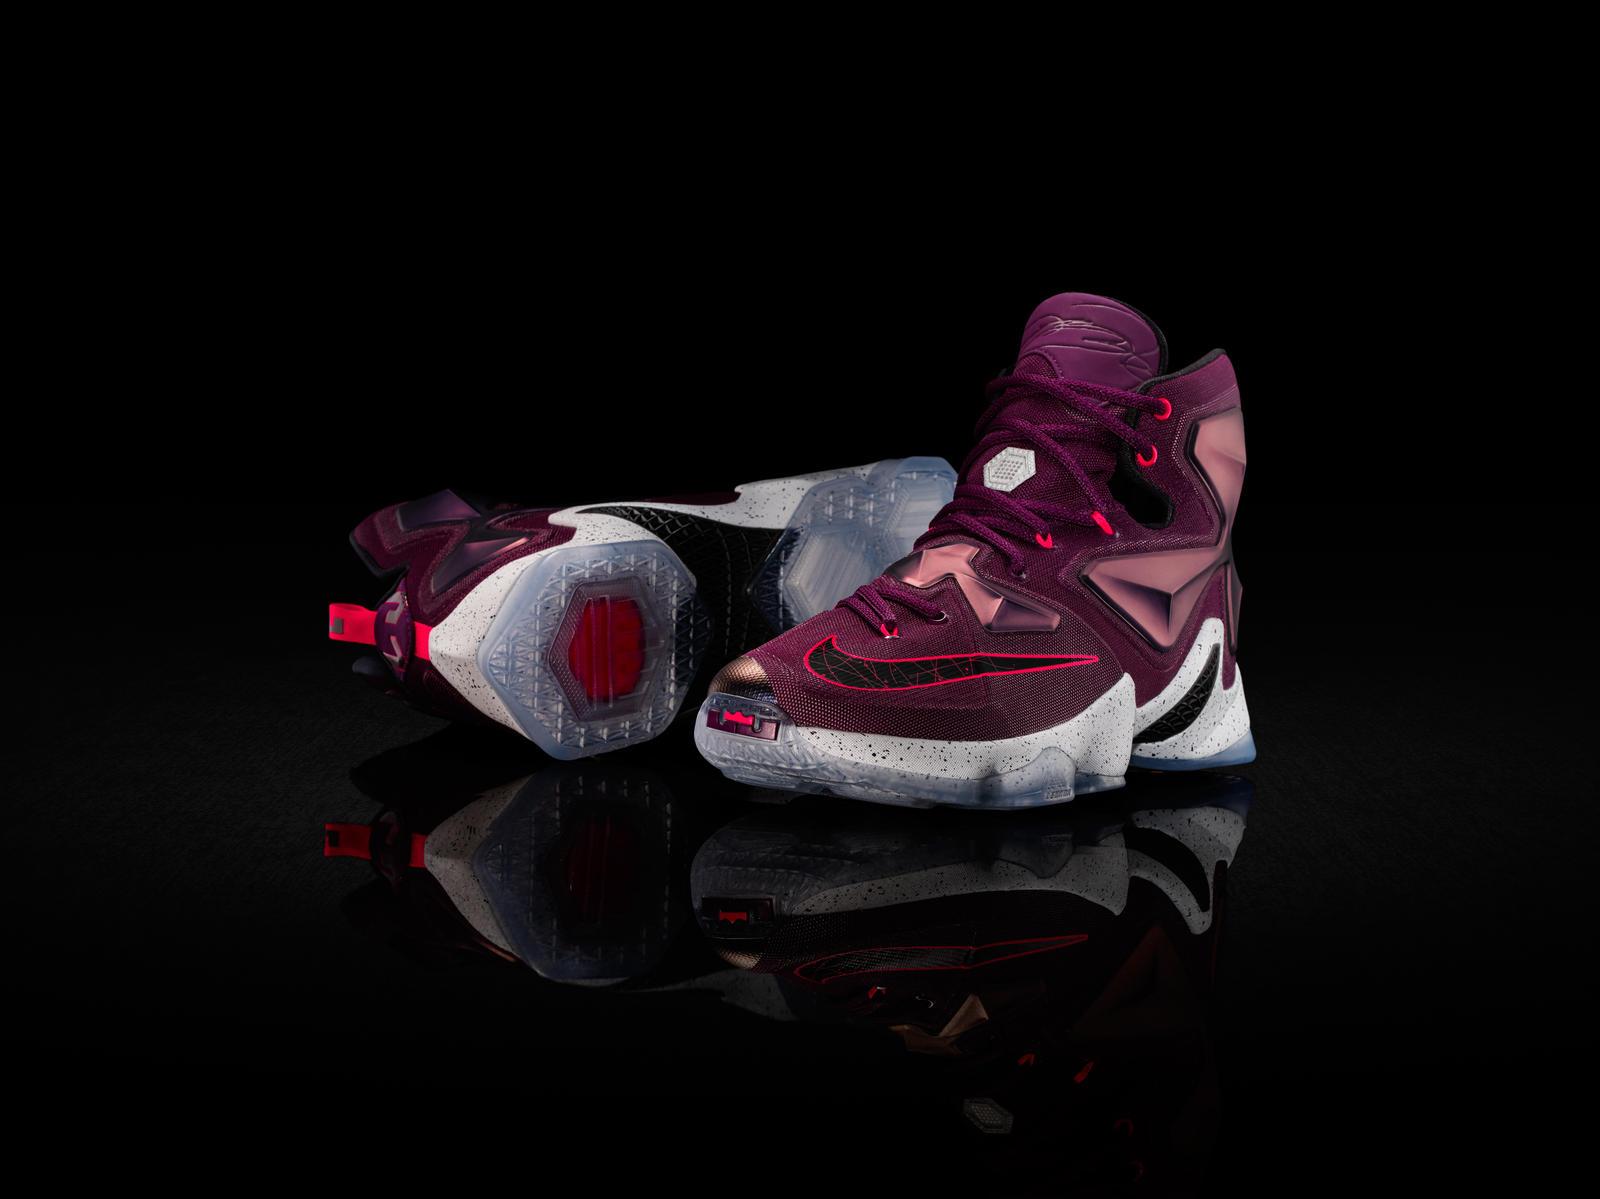 e29d93f561e8 NBA Player LeBron James Unveils His 13th Signature Sneaker ...